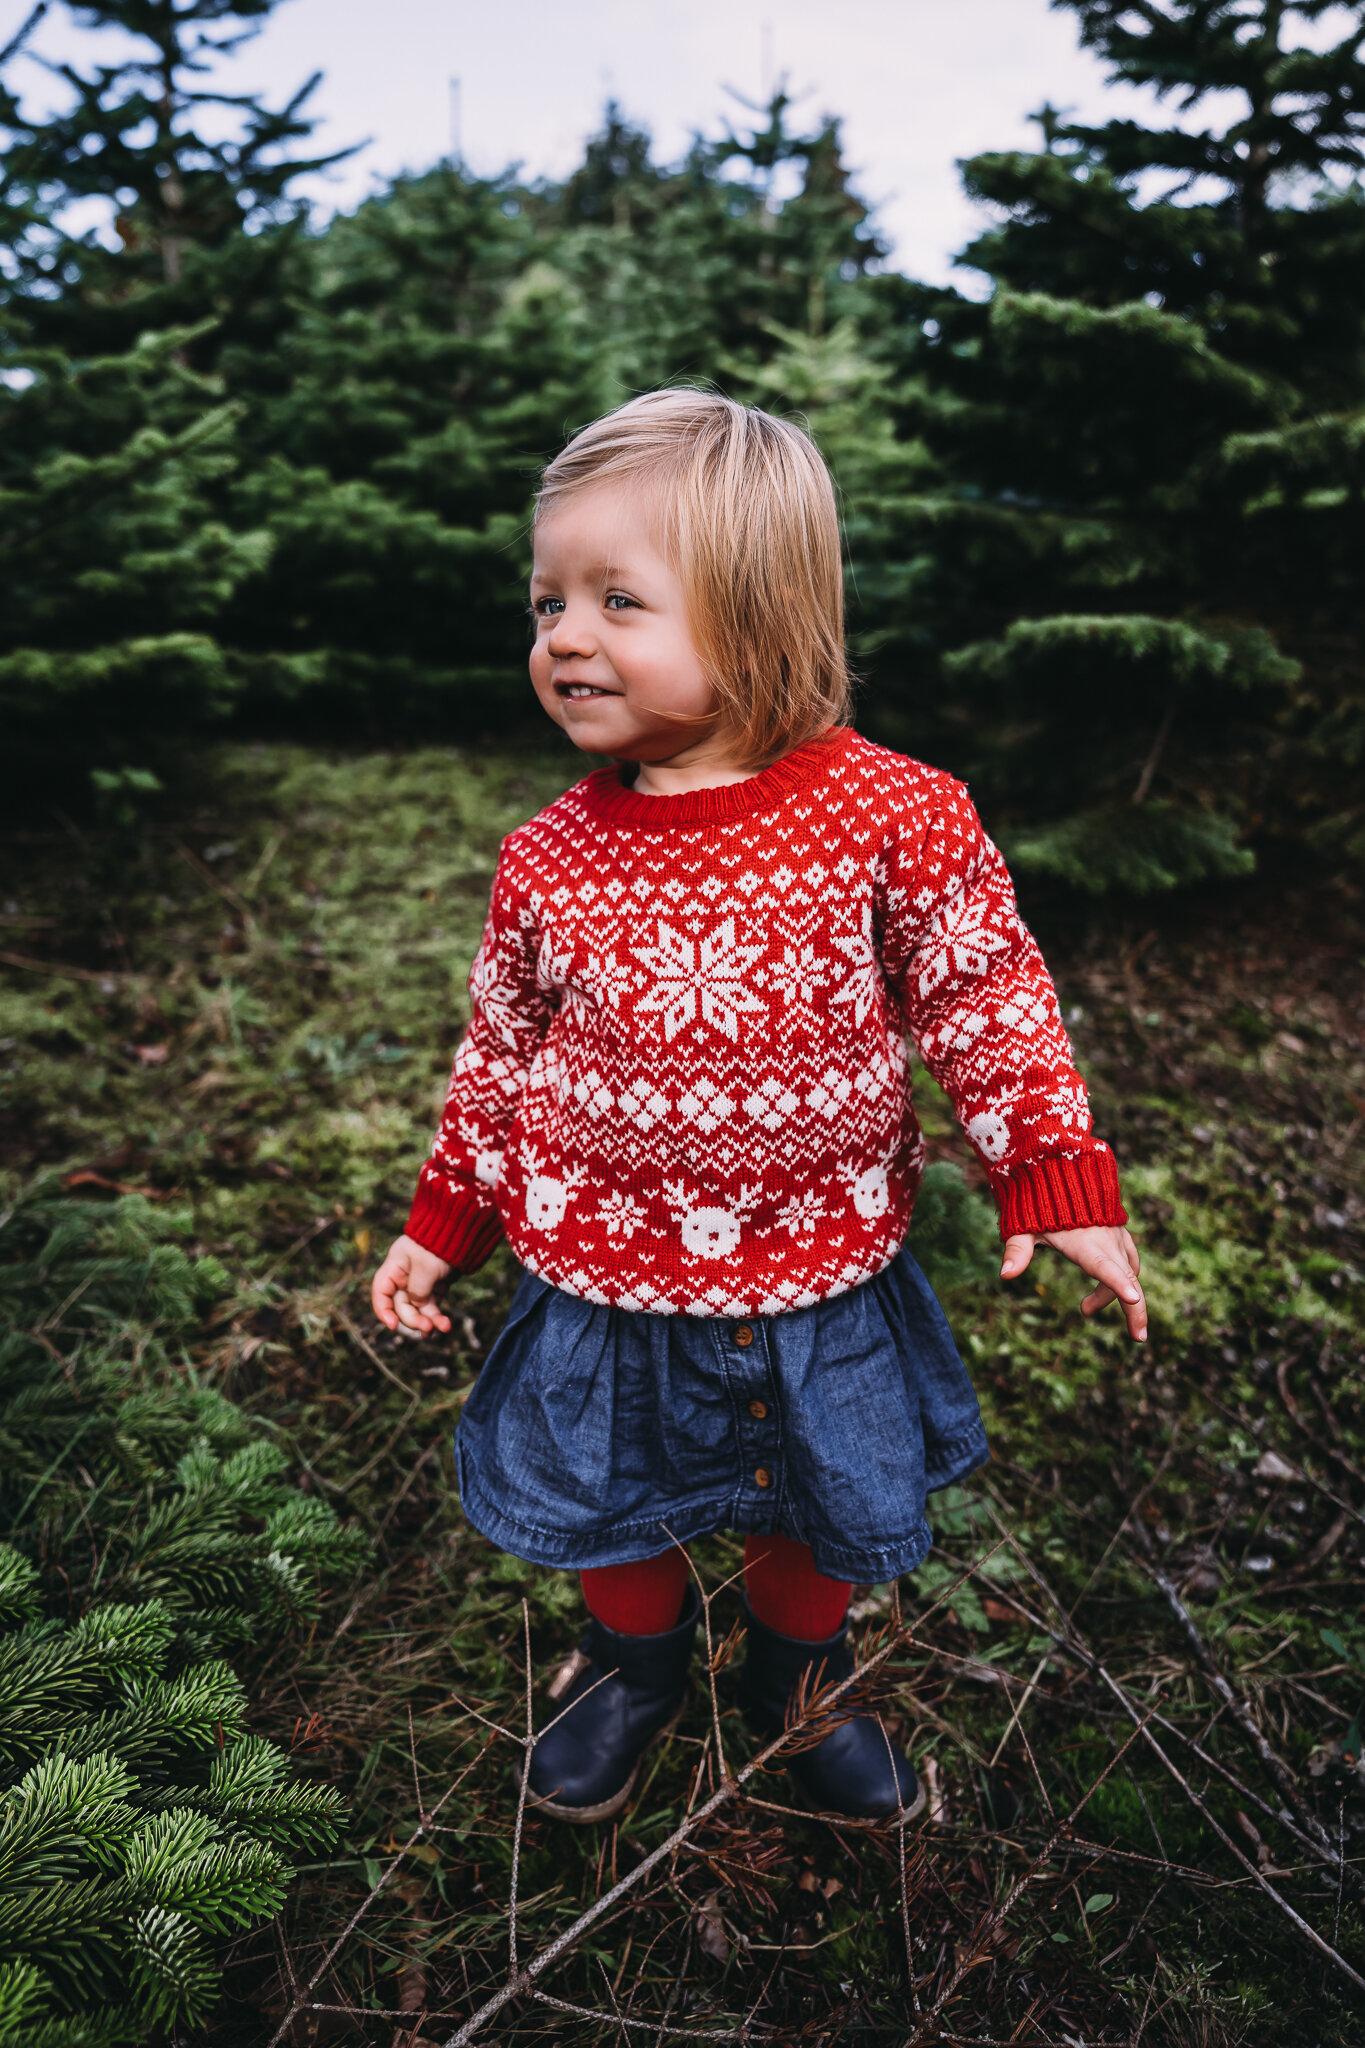 Christmas Tree Farm Mini Portrait Sessions Family Photoshoots Cheshire Alison Holcroft Photography